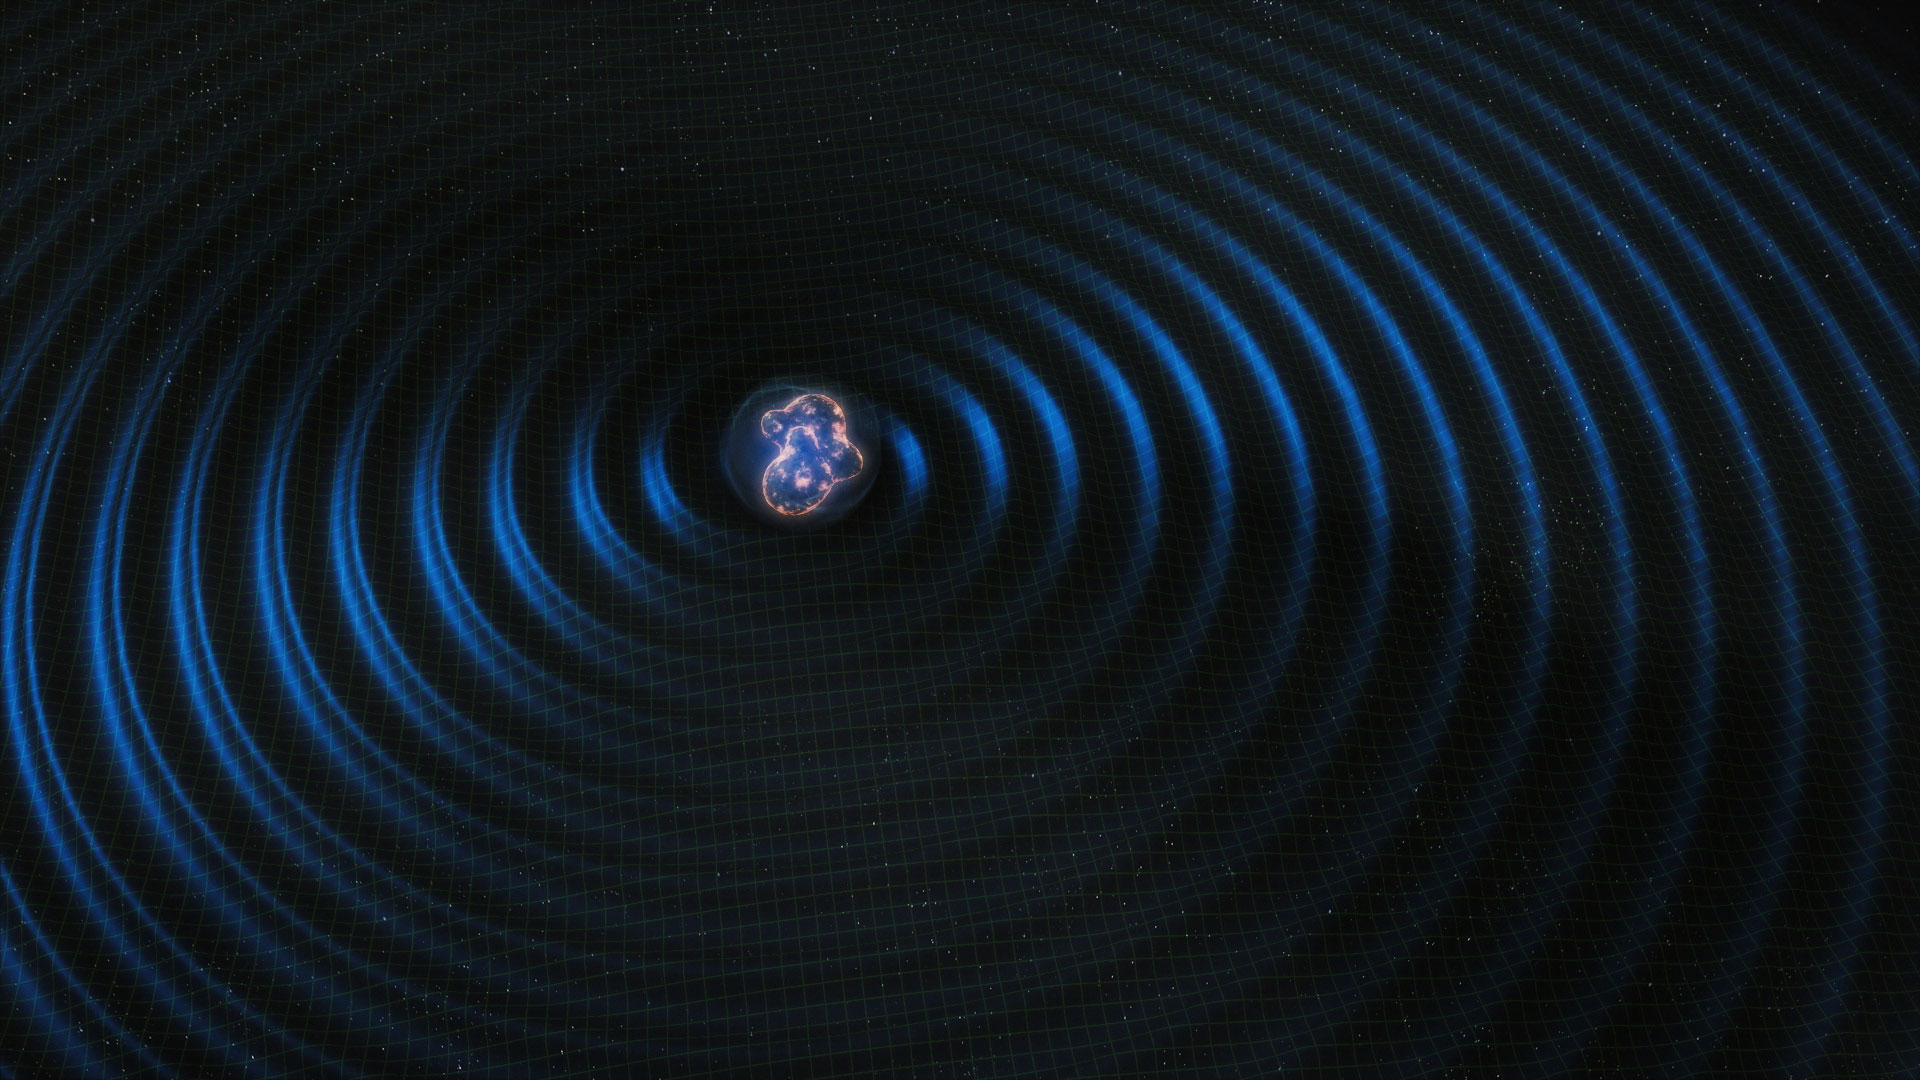 Colliding Neutron Stars Could Settle Cosmologys Biggest 1920x1080